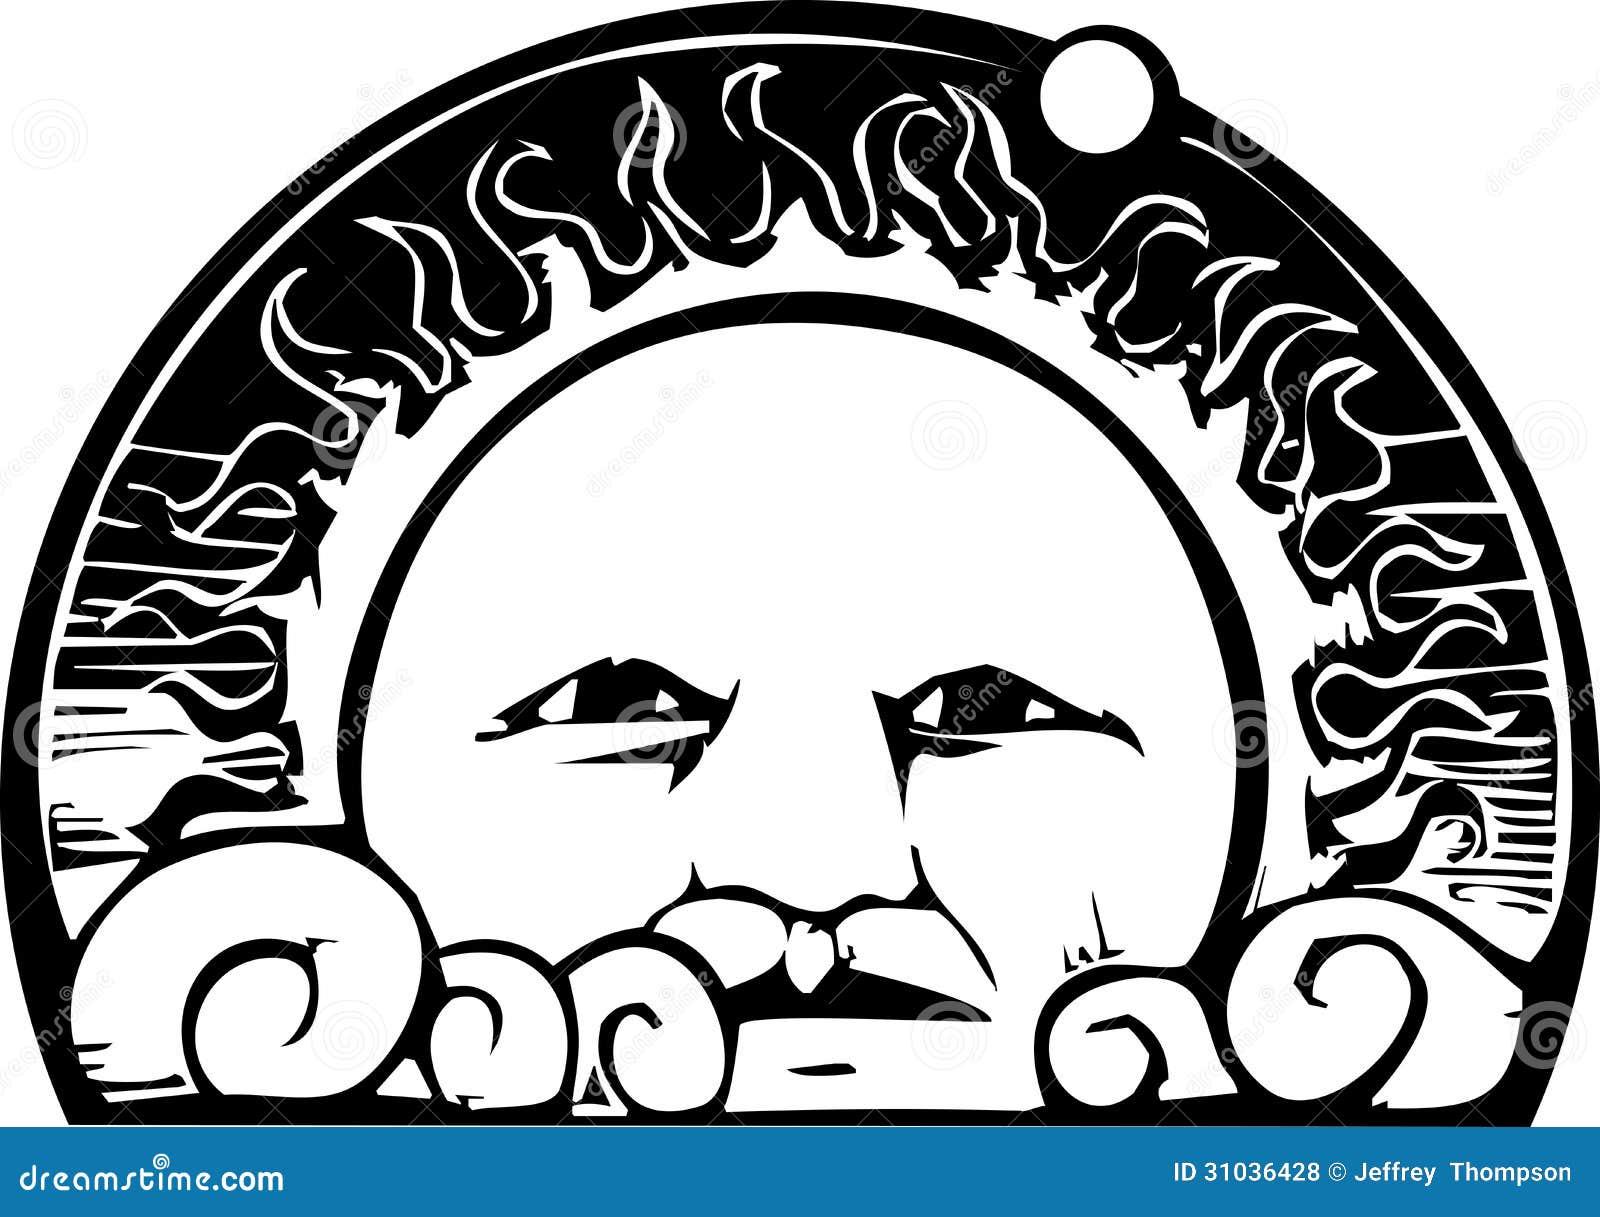 Line Art Of Sun : Sun face and planet orbit stock vector. illustration of woodcut